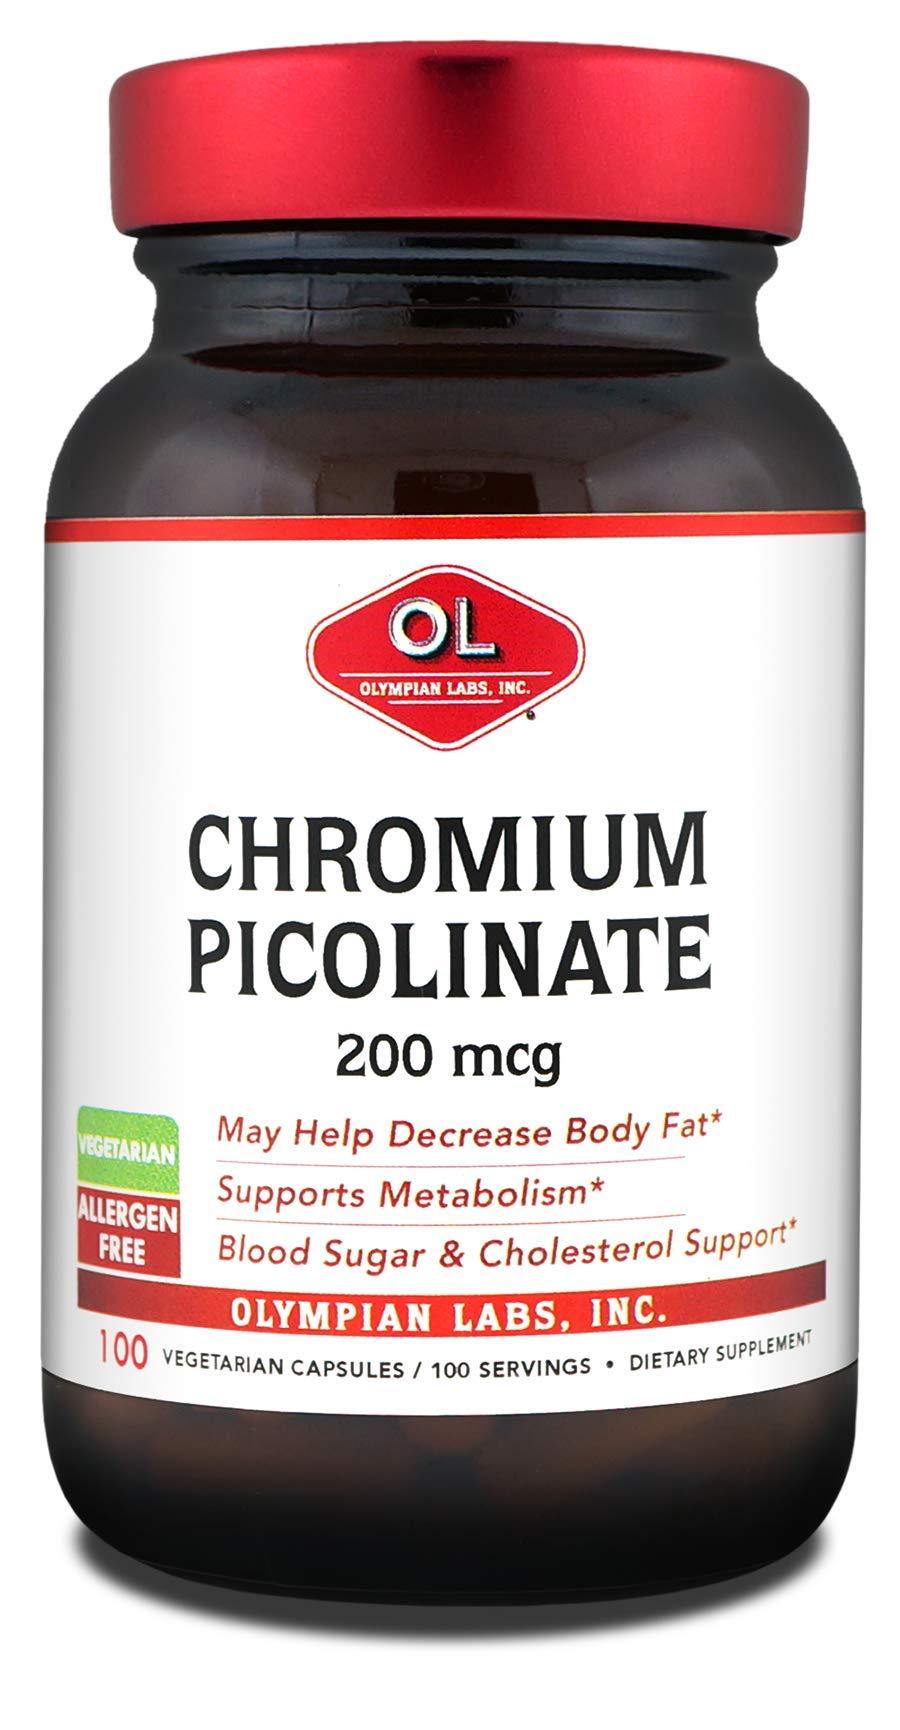 Olympian Labs Chromium Picolinate, Chromate, 200mcg by Olympian Labs